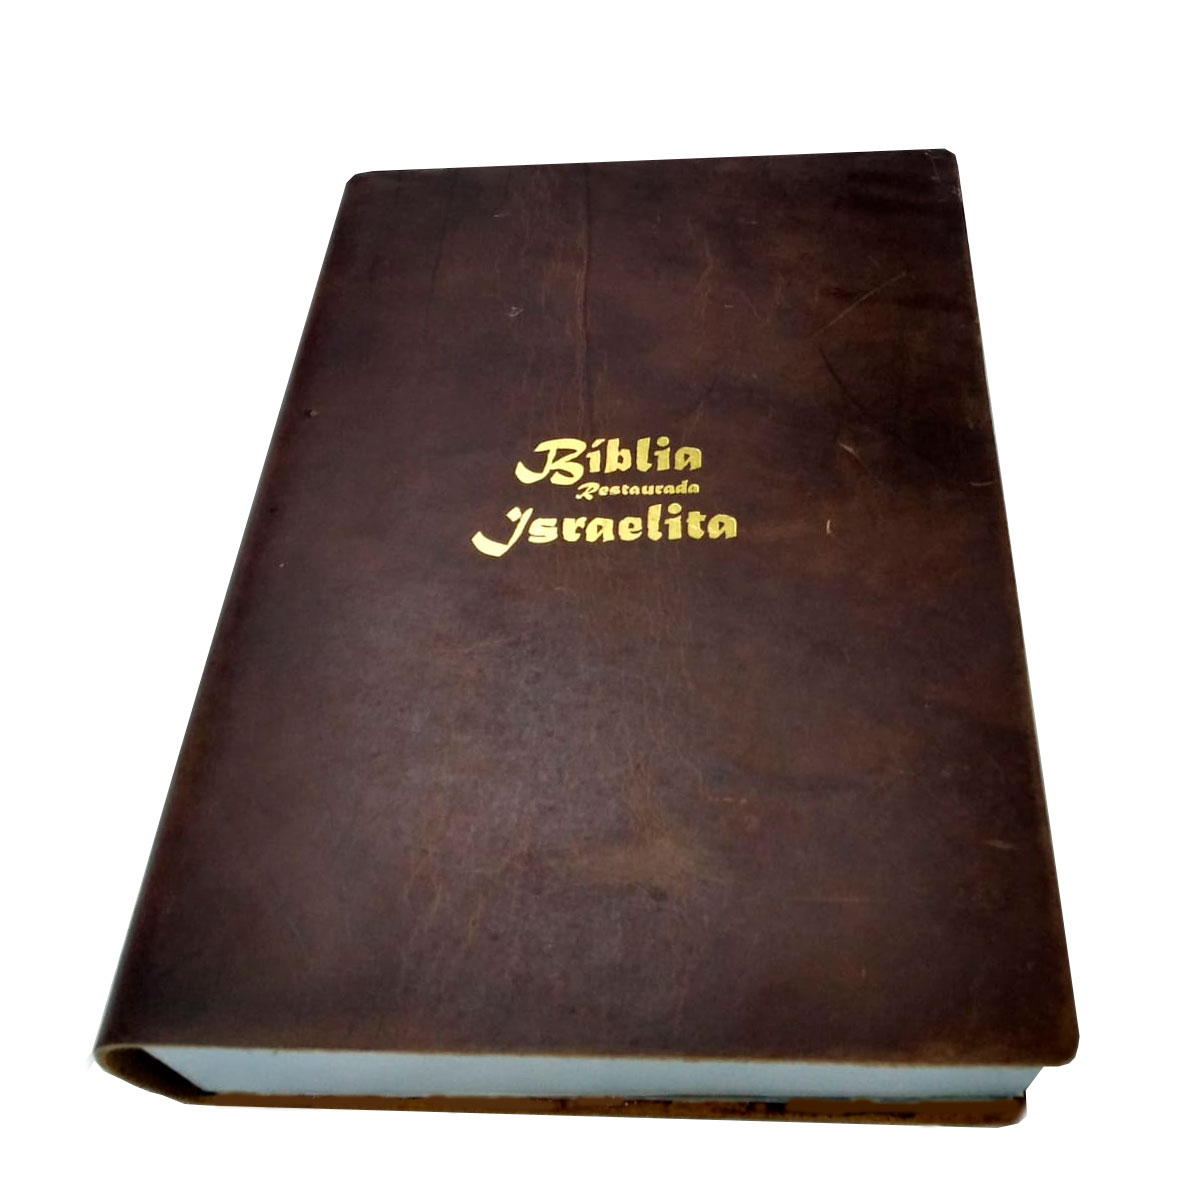 Bíblia Israelita capa couro legitimo - Cor Marrom